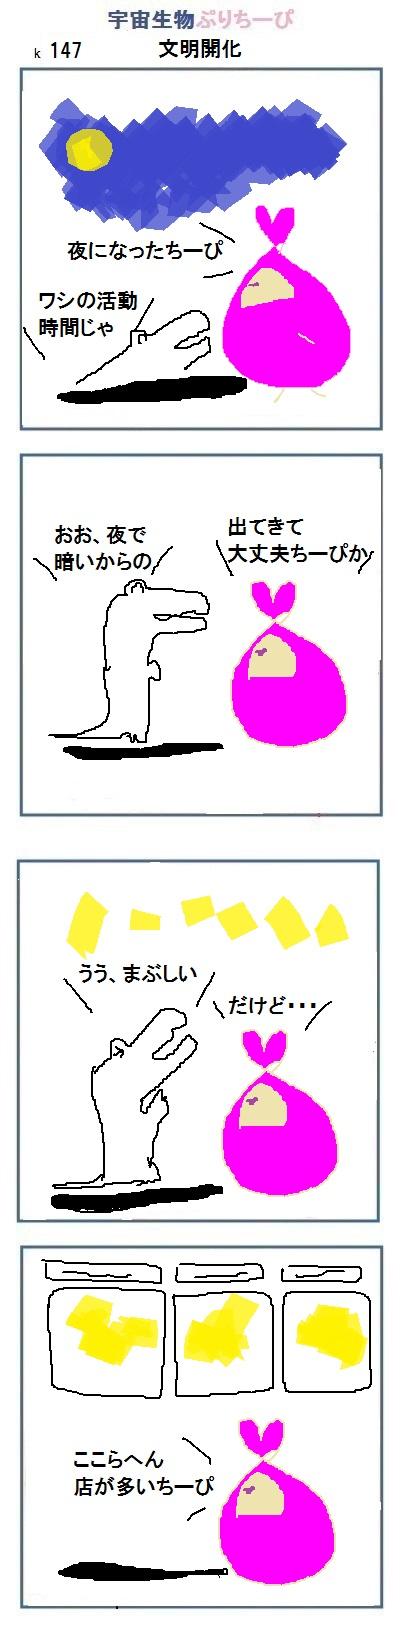 161027_k144